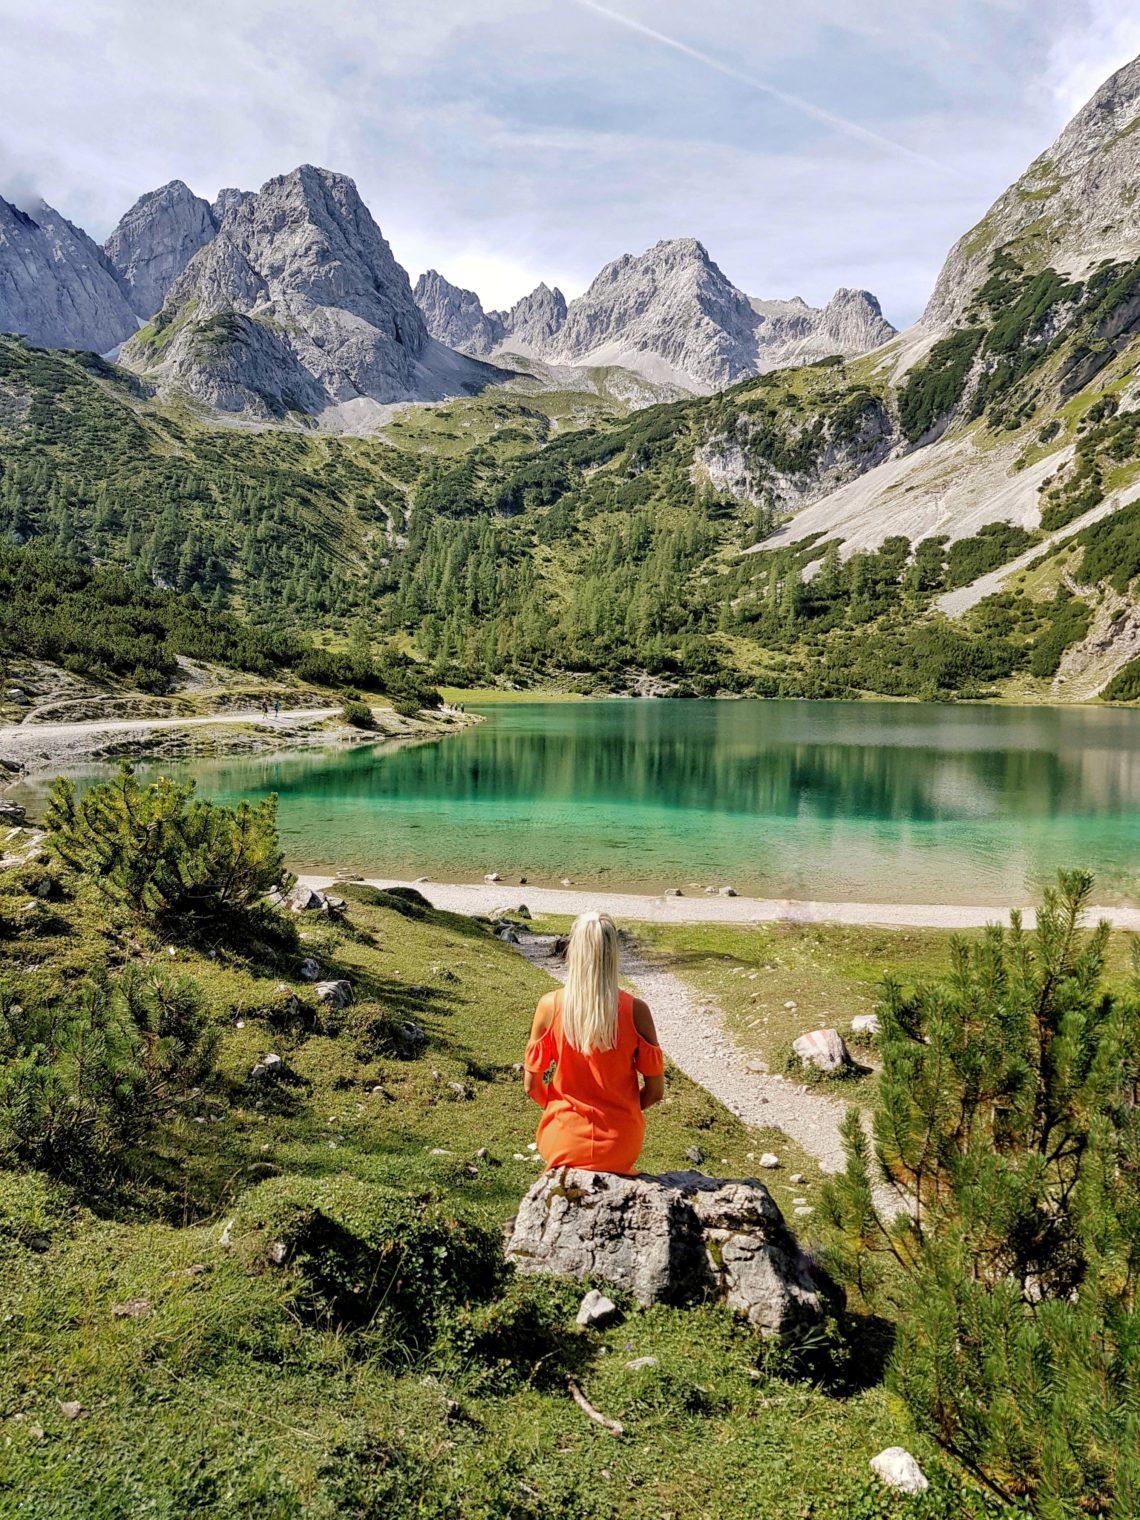 Ehrwaldalm, Seebensee, Wandern, Österreich, Berge